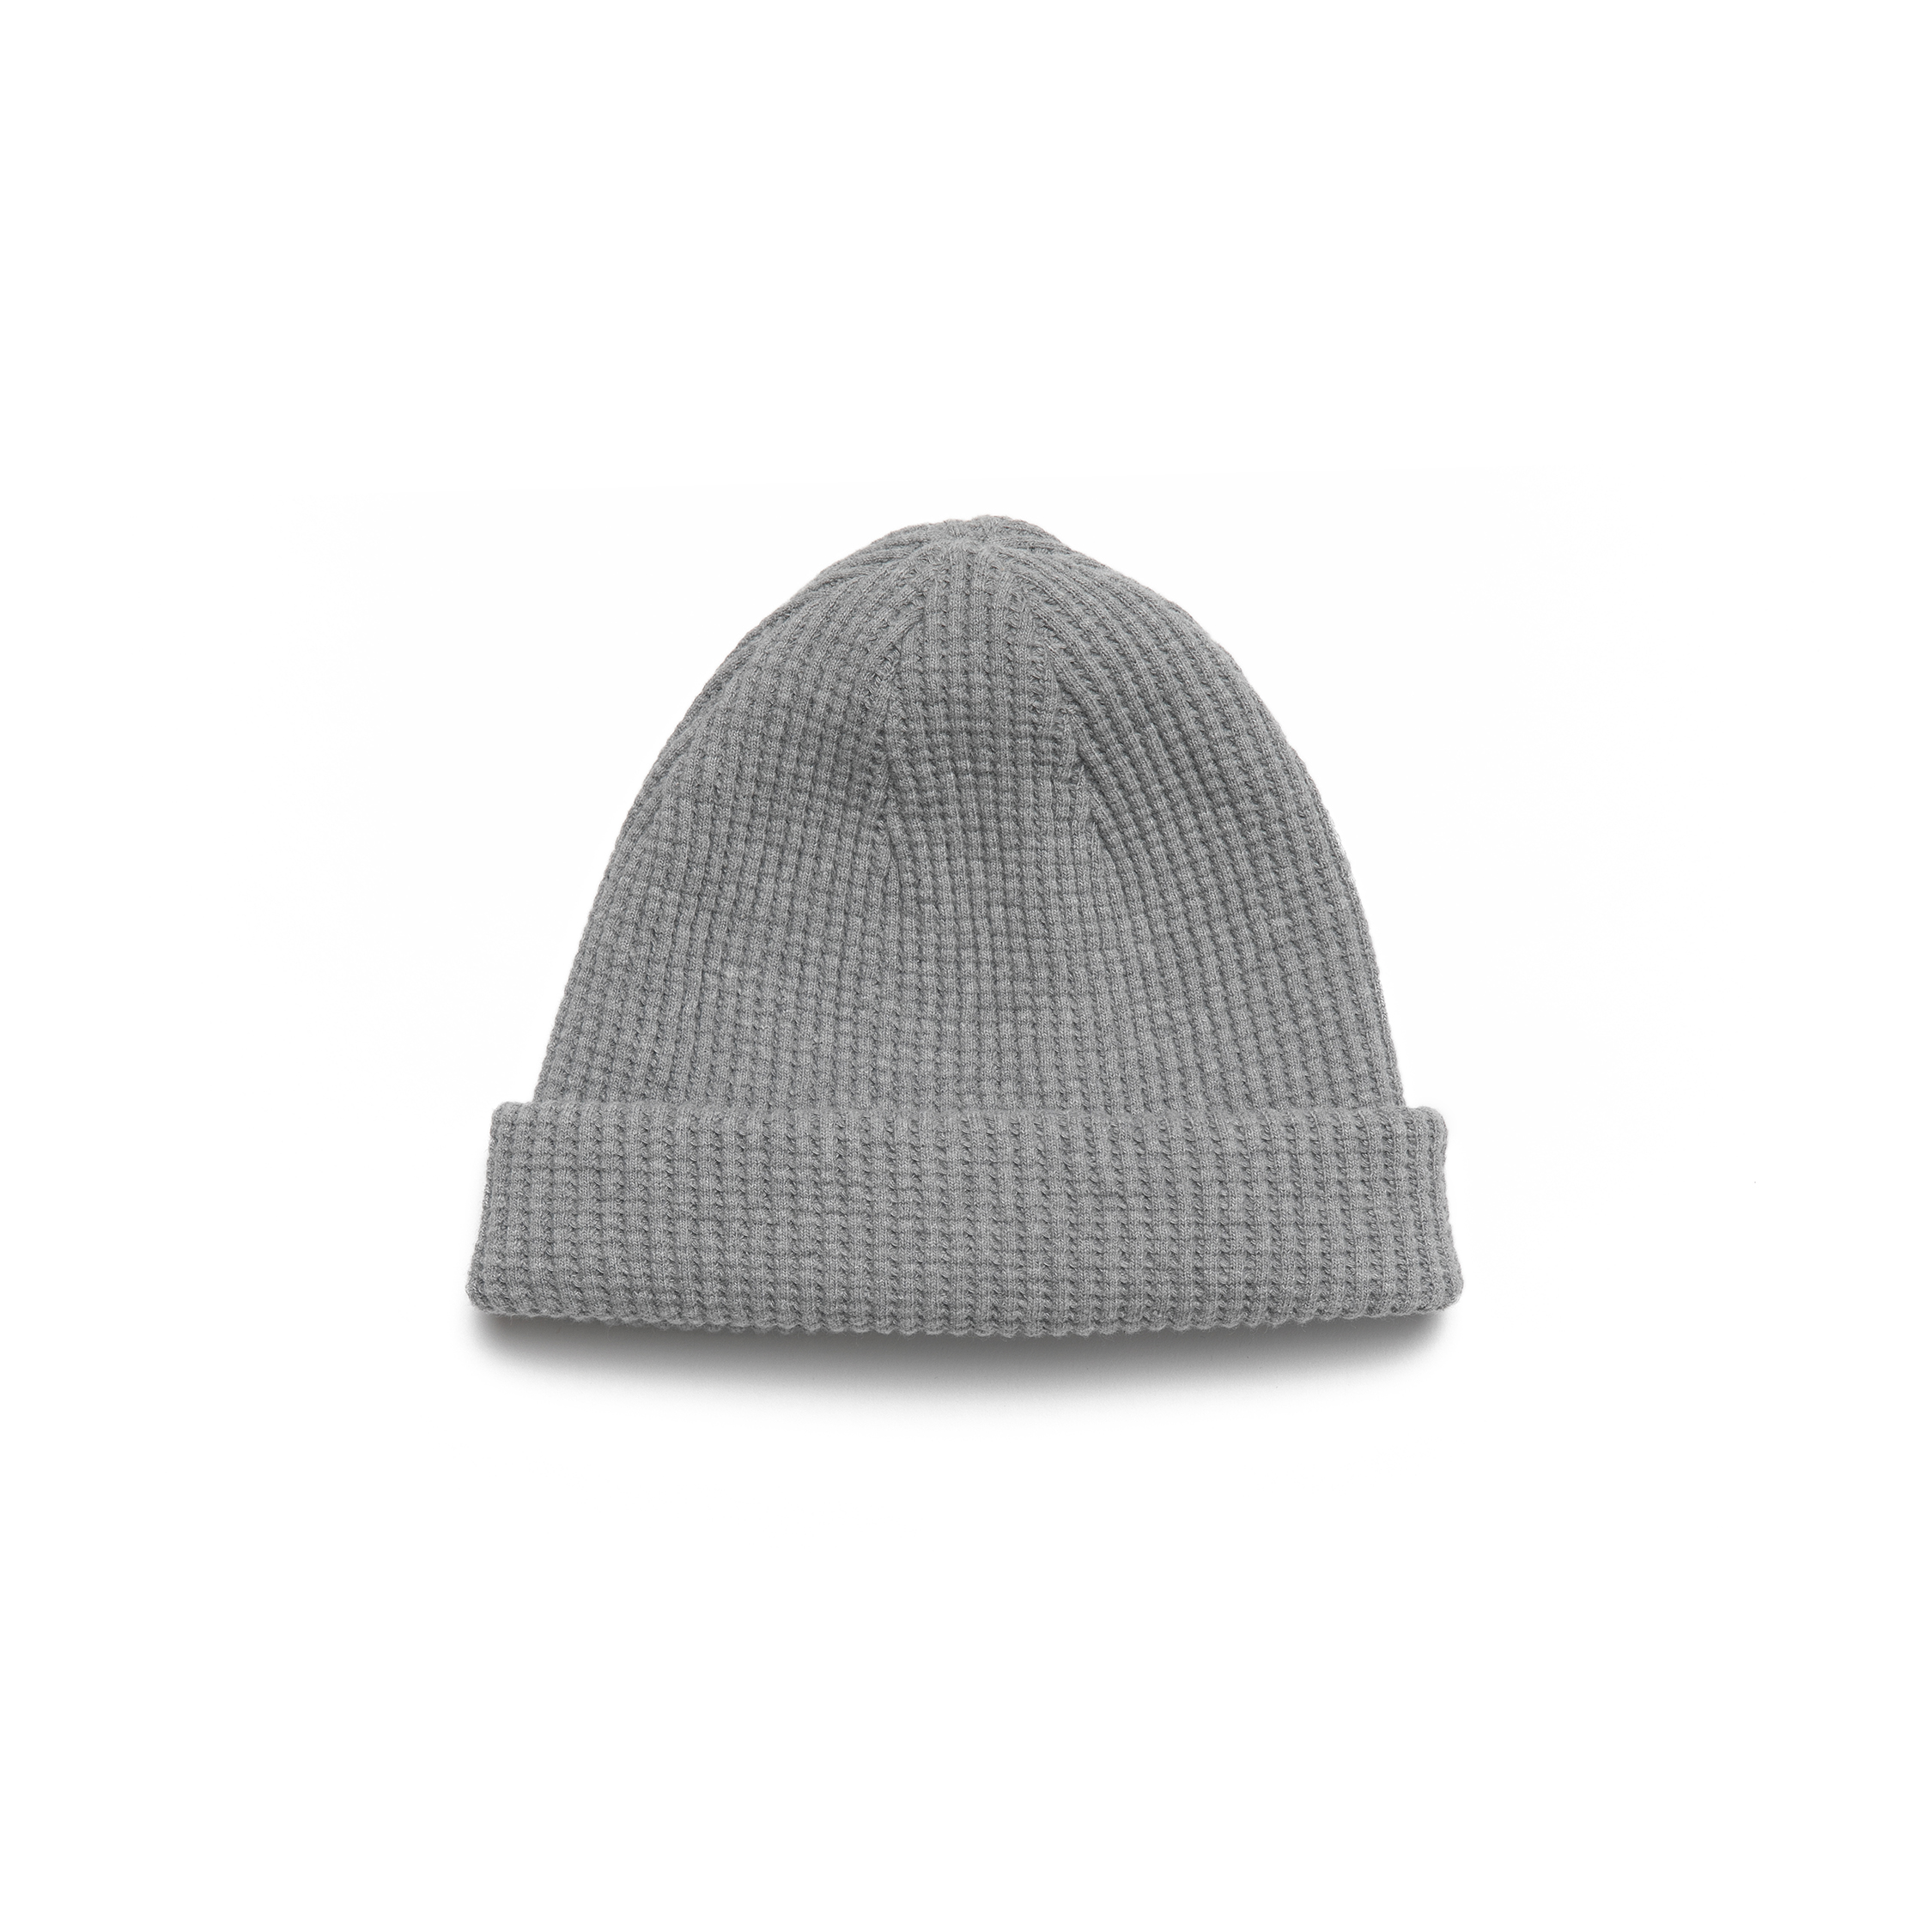 Homesun Knitwear Heavyweight Thermal Knit Cap :: Grey